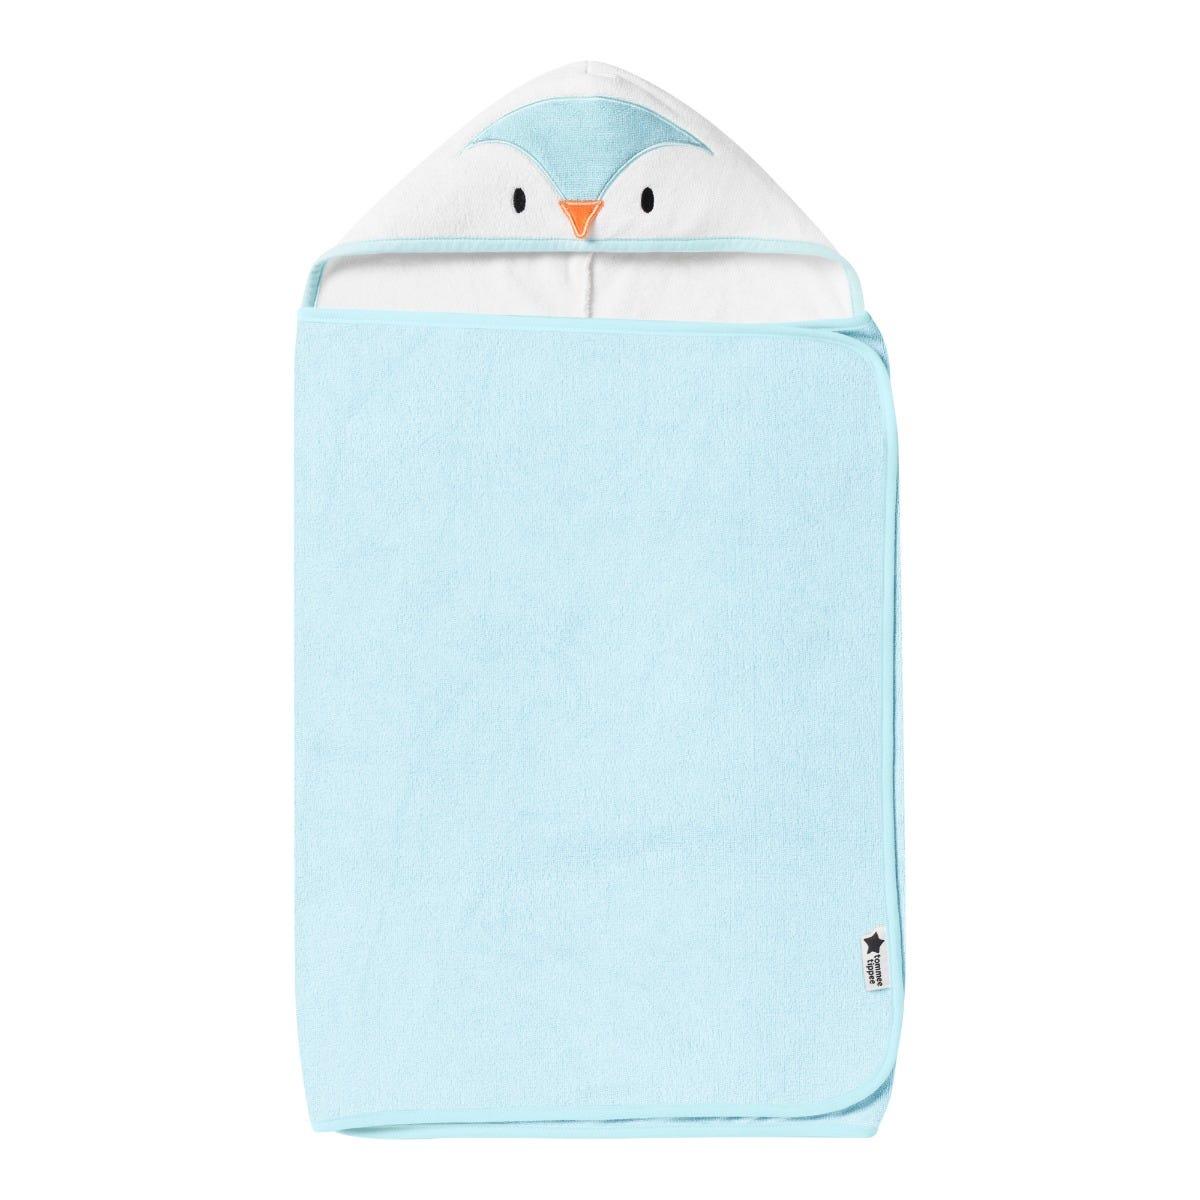 Splashtime hug 'n' dry hooded towel  - blue